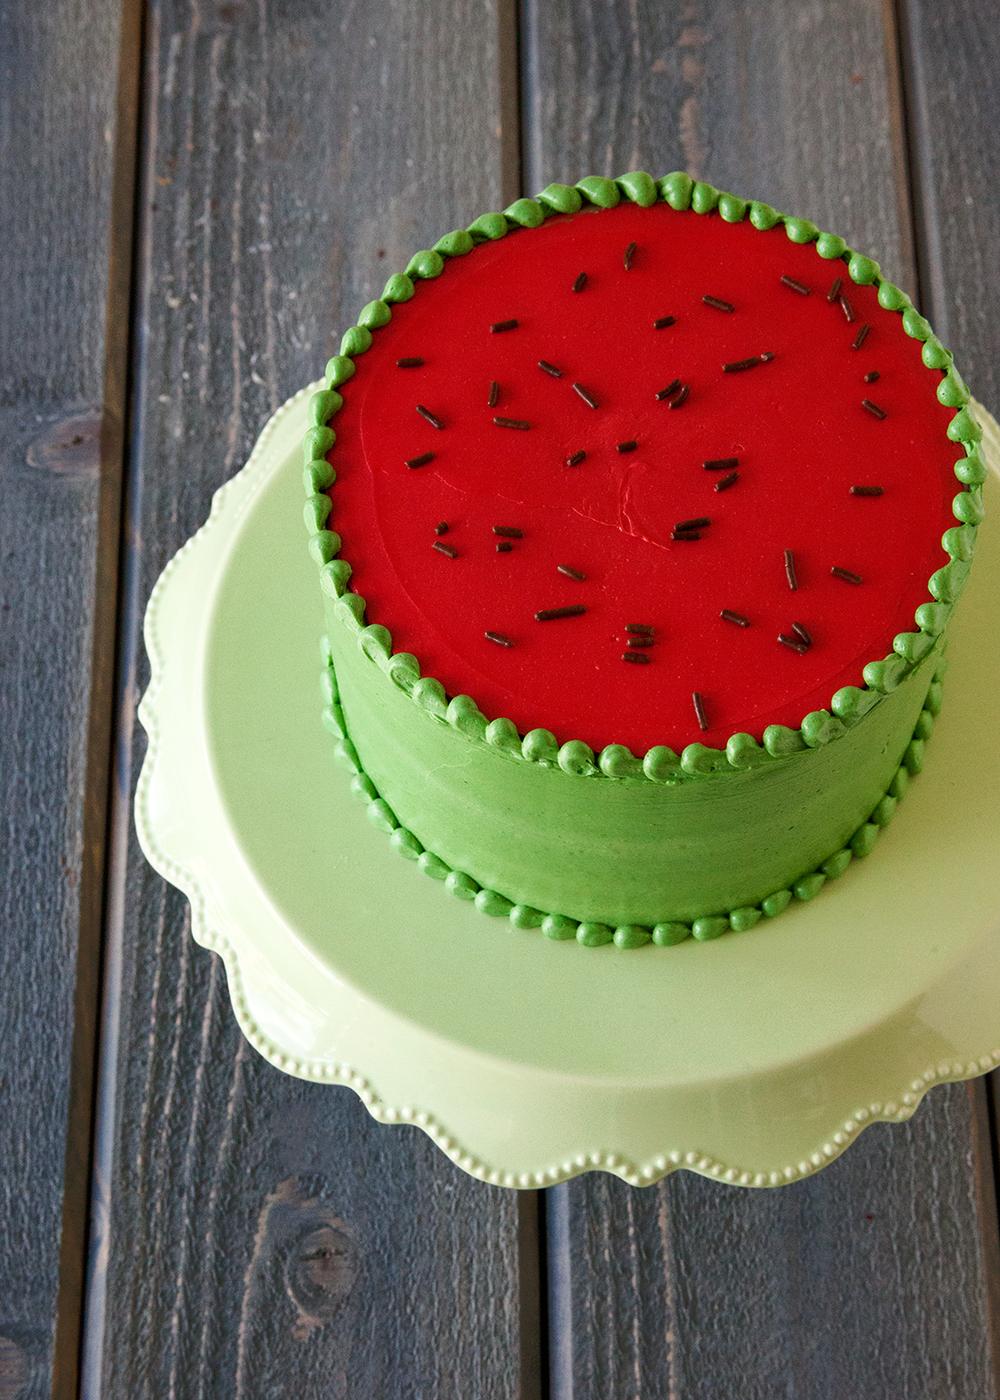 WatermelonCake96